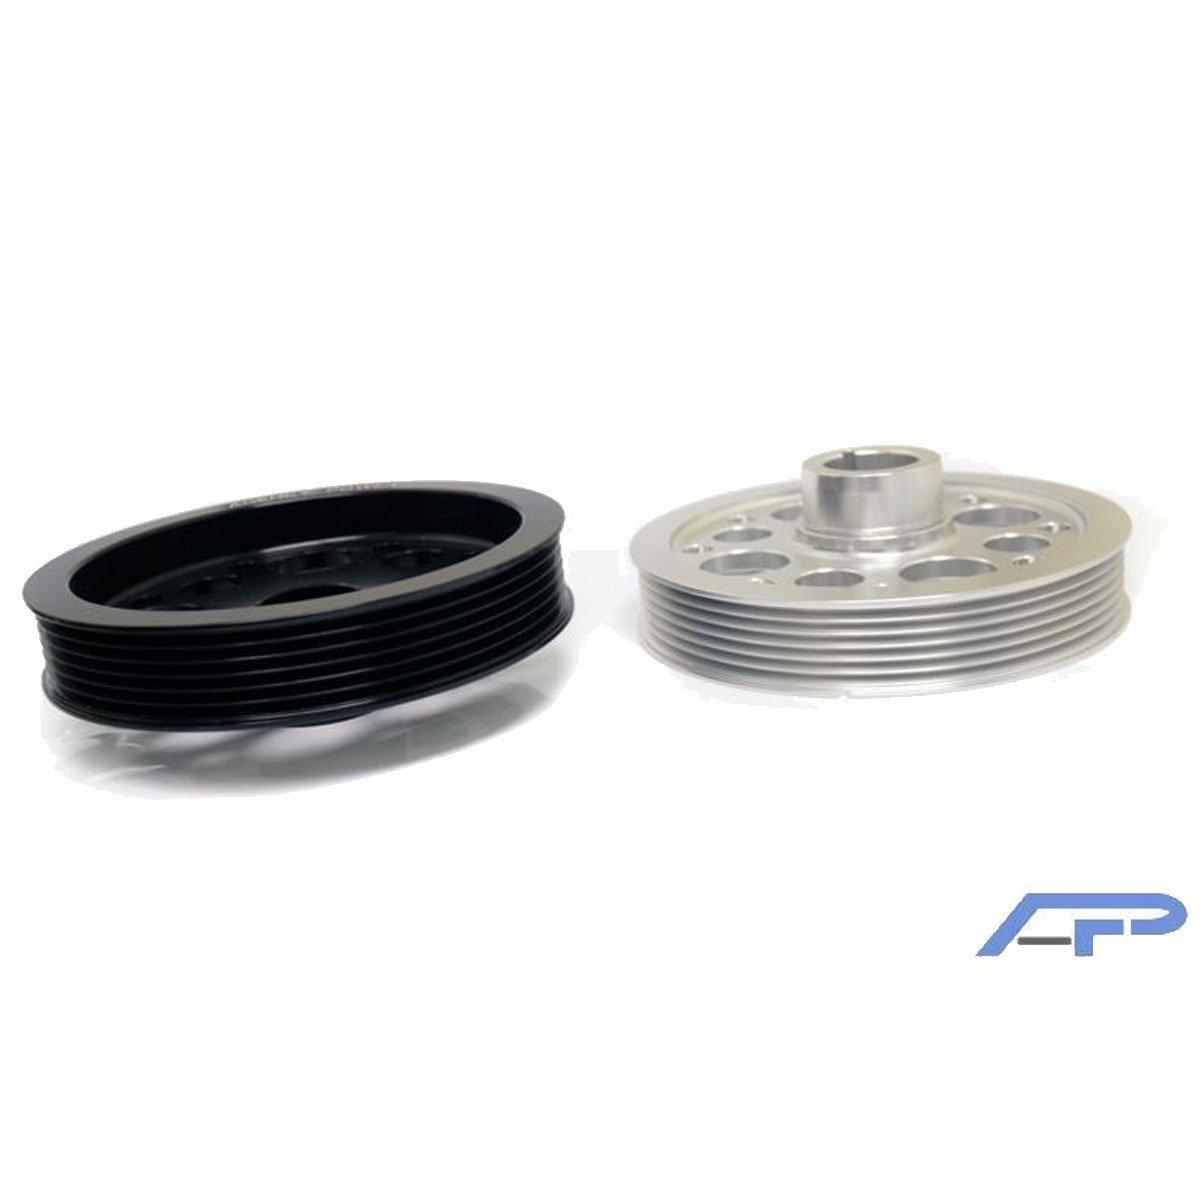 Agency Power (AP-CZ4A-130B) Crank Pulley for Mitsubishi, Black